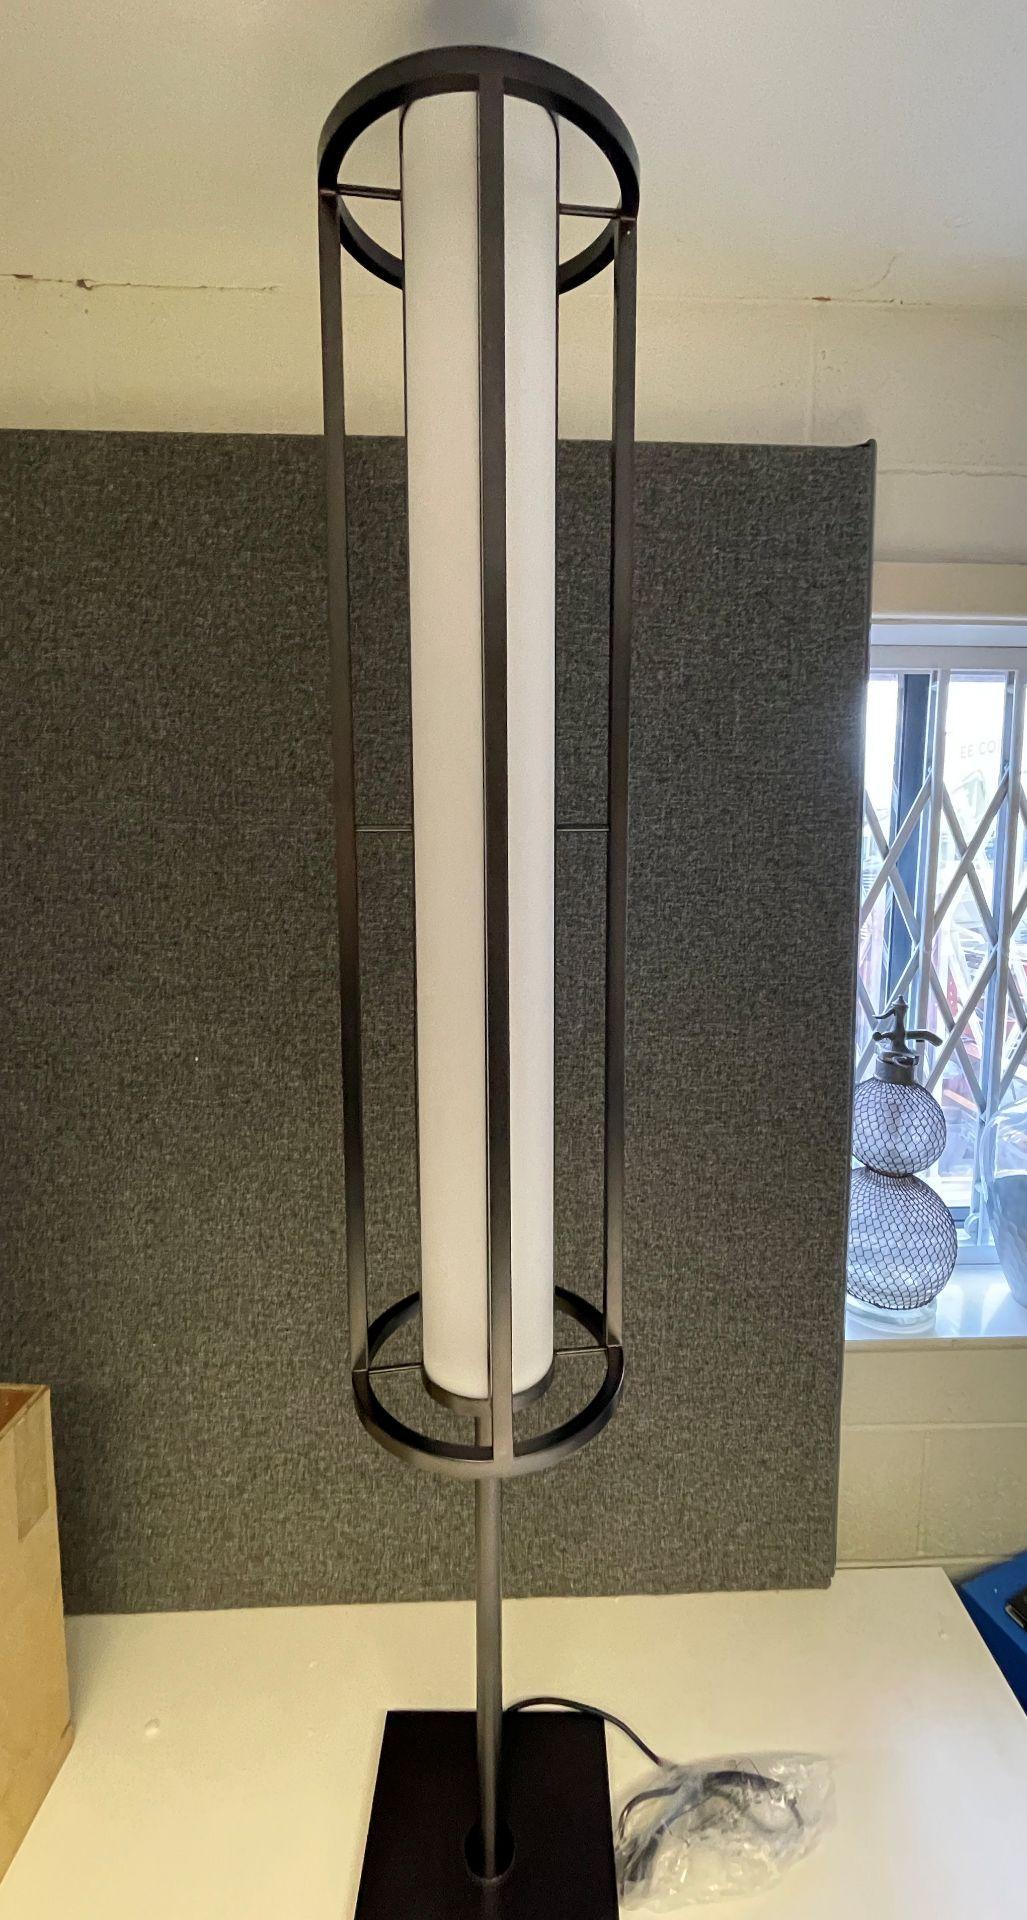 1 x Chelsom Art Deco Style Floor Lamp in Black/Bronze Height 161cm x 30cm Diameter - Ref: CHL197 -